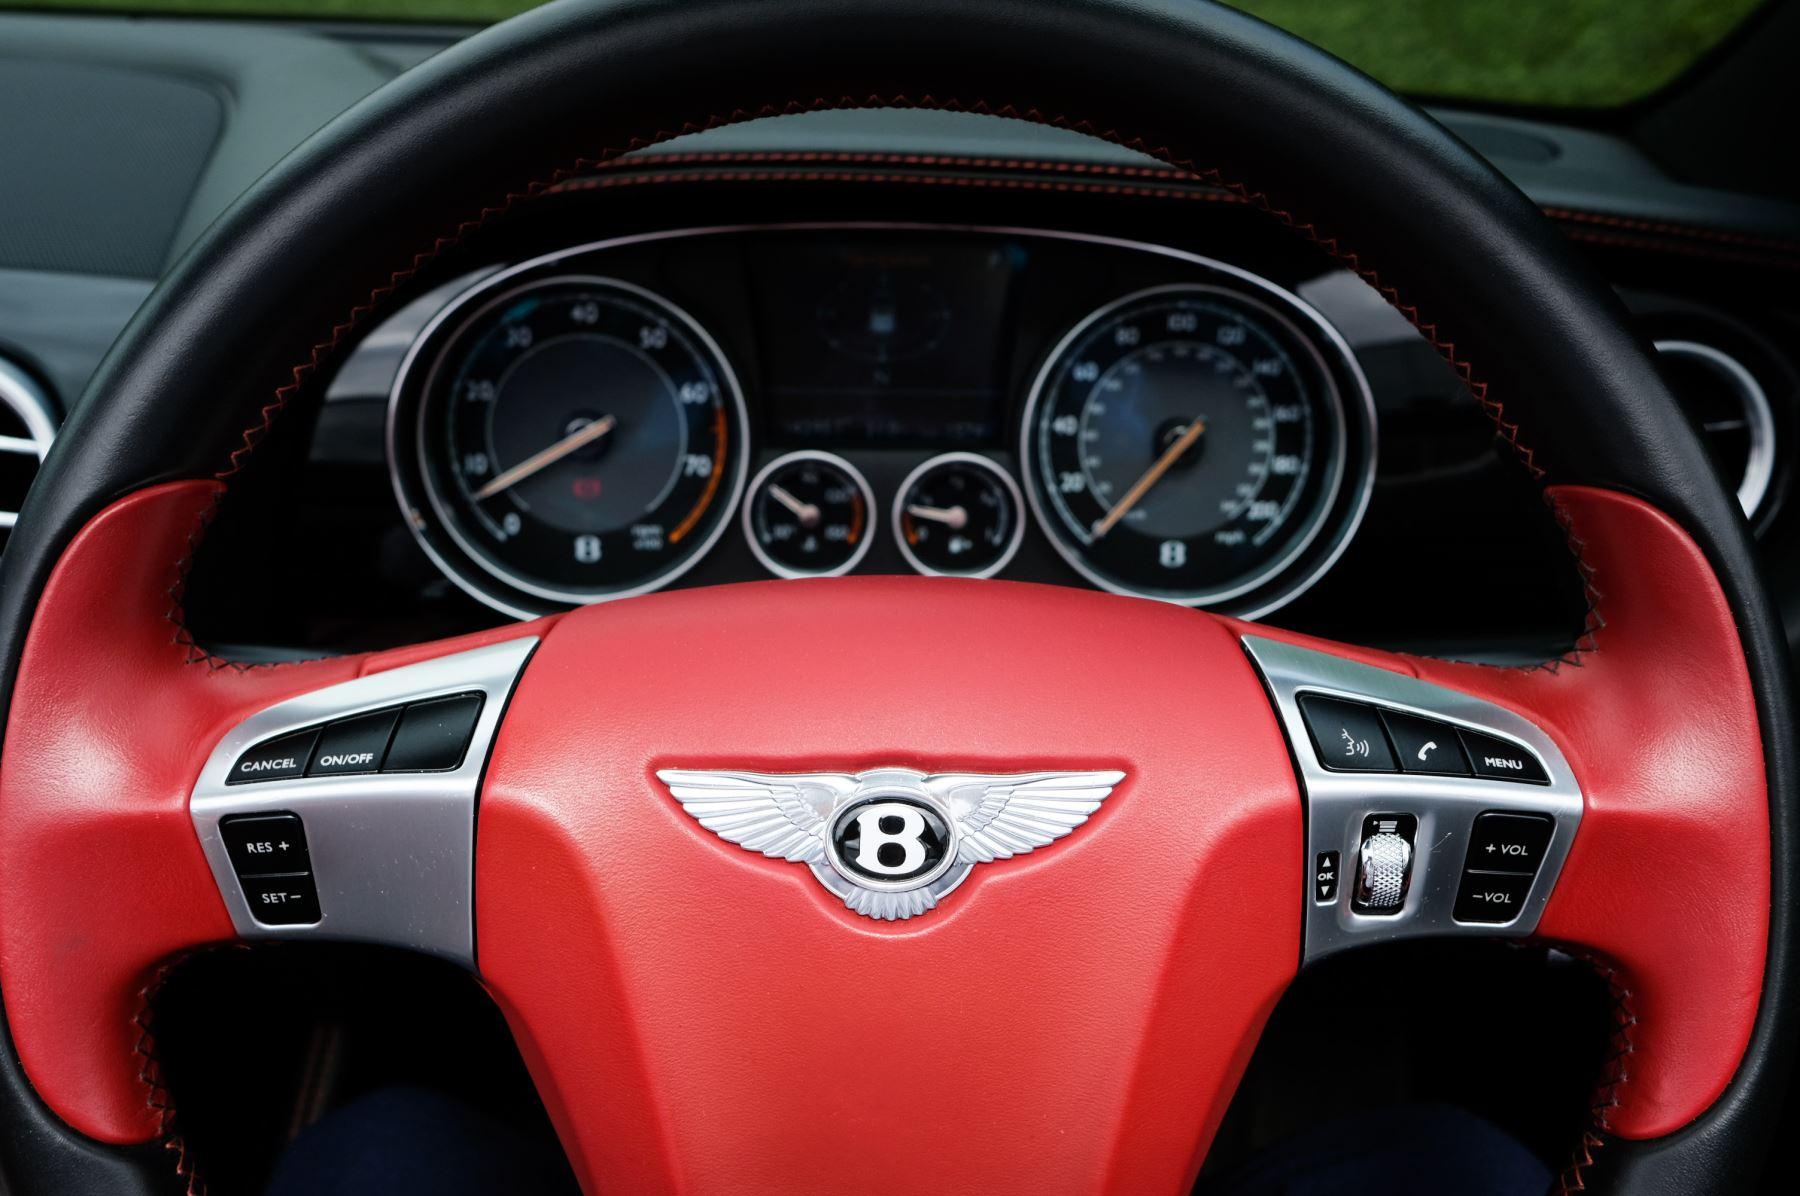 Bentley Continental GTC 6.0 W12 Speed - Massage Seats & Ventilation - Neck Warmer - Rear View Camera image 17